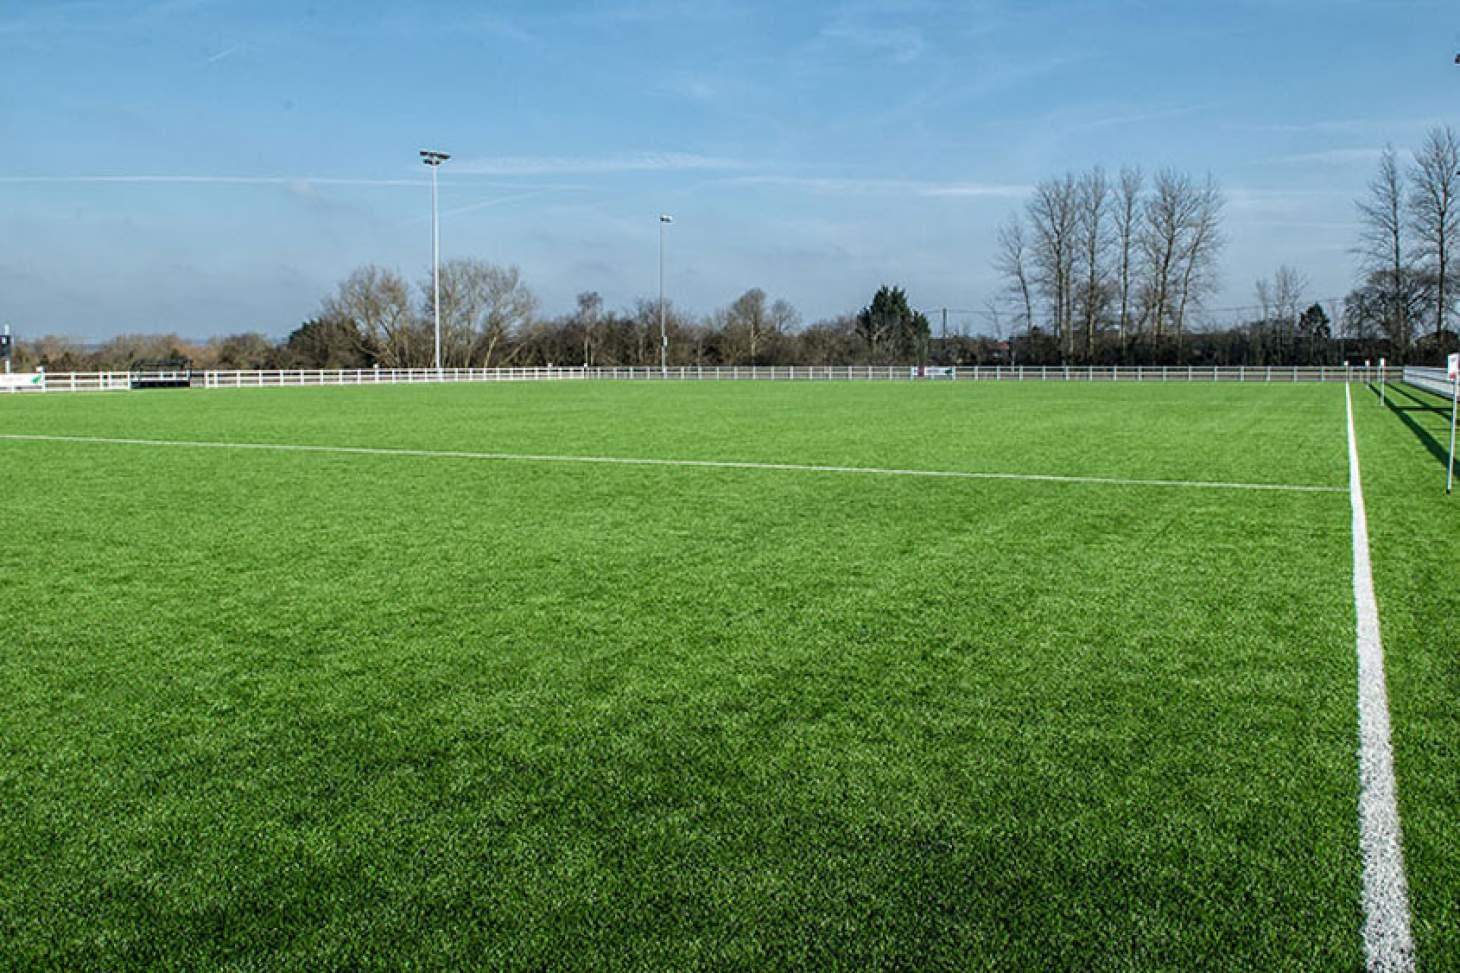 PlayFootball Harpenden 5 a side | 3G Astroturf football pitch